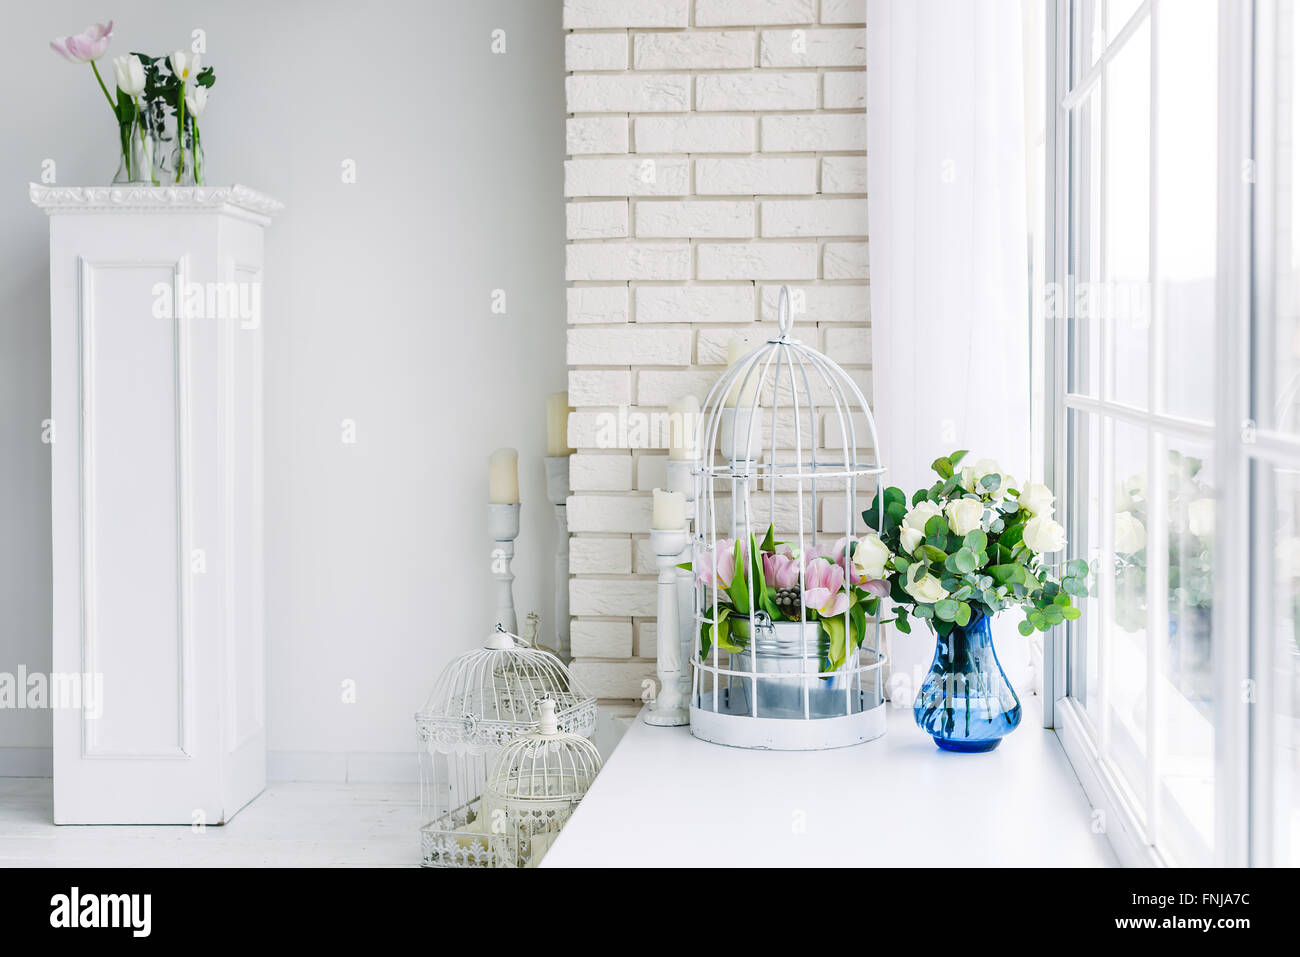 Great Flowers On The Windowsill In Studio